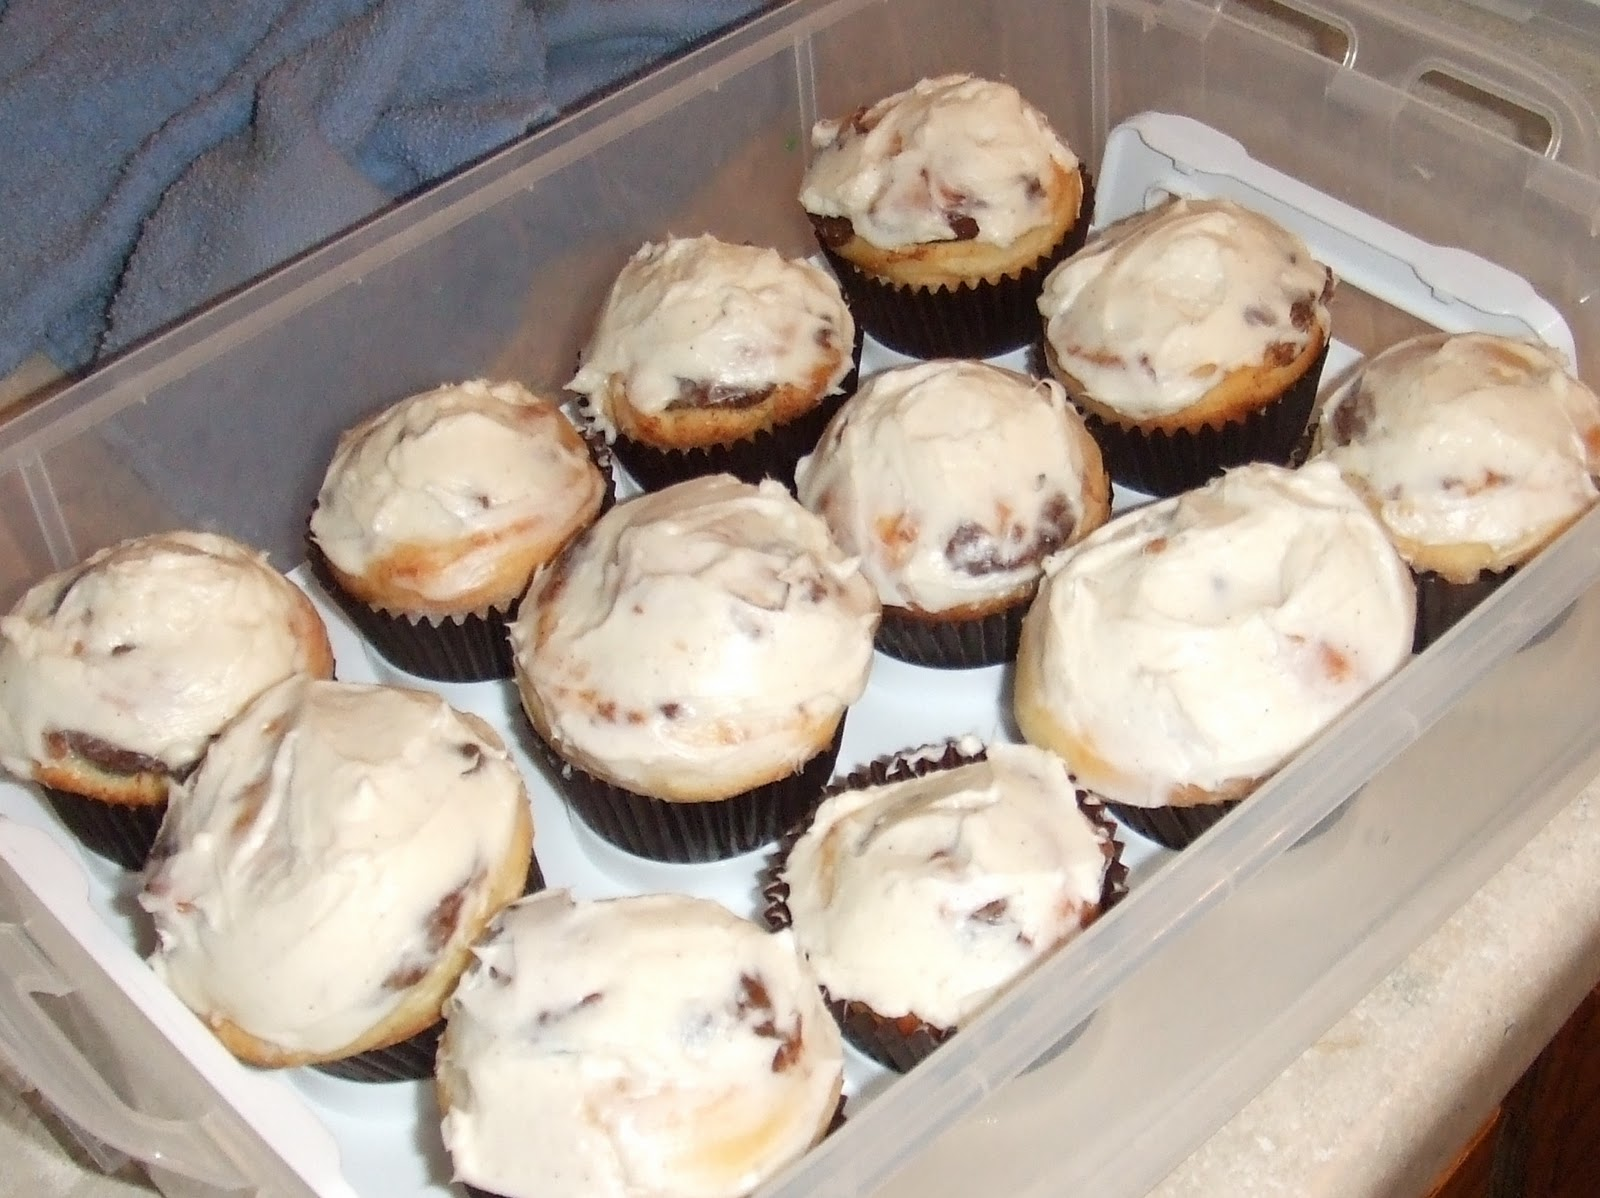 The Sweet Stuff: Roasted Banana Cinnamon Roll Cupcakes